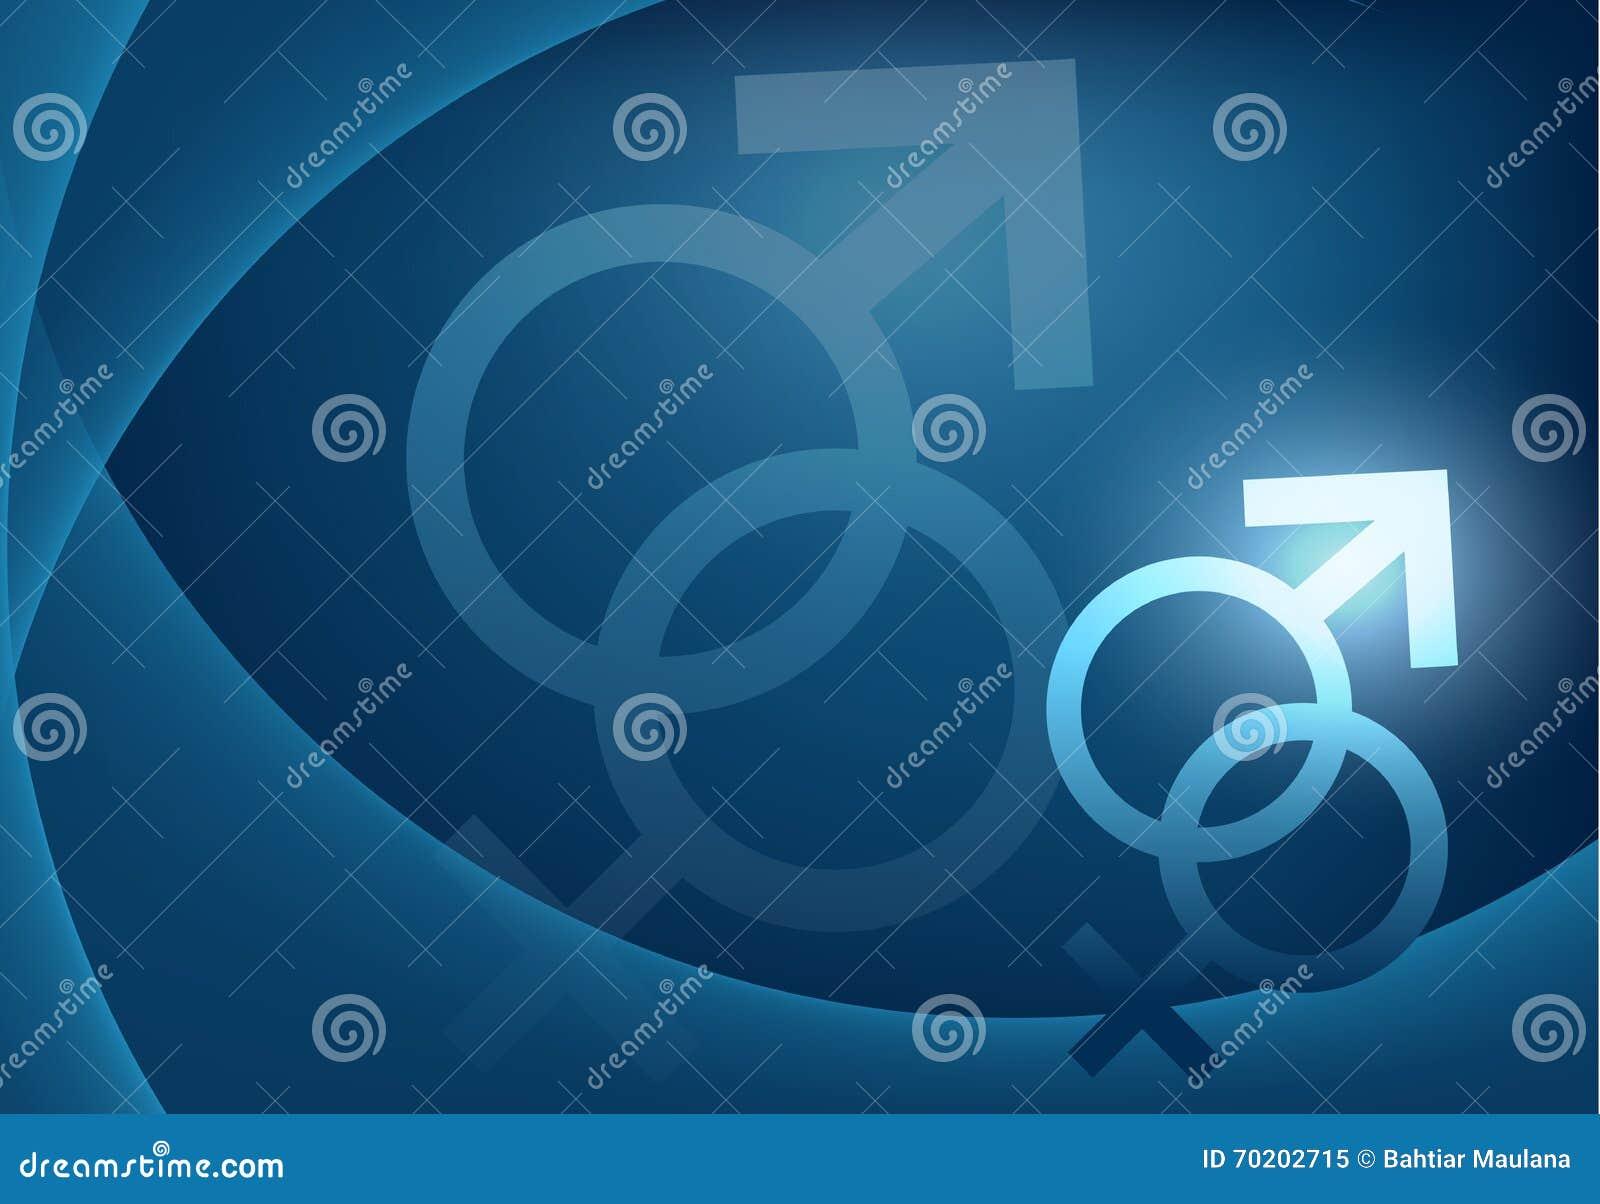 Medical background with male female medical symbol stock vector illustration of medical background with male female medical symbol buycottarizona Images